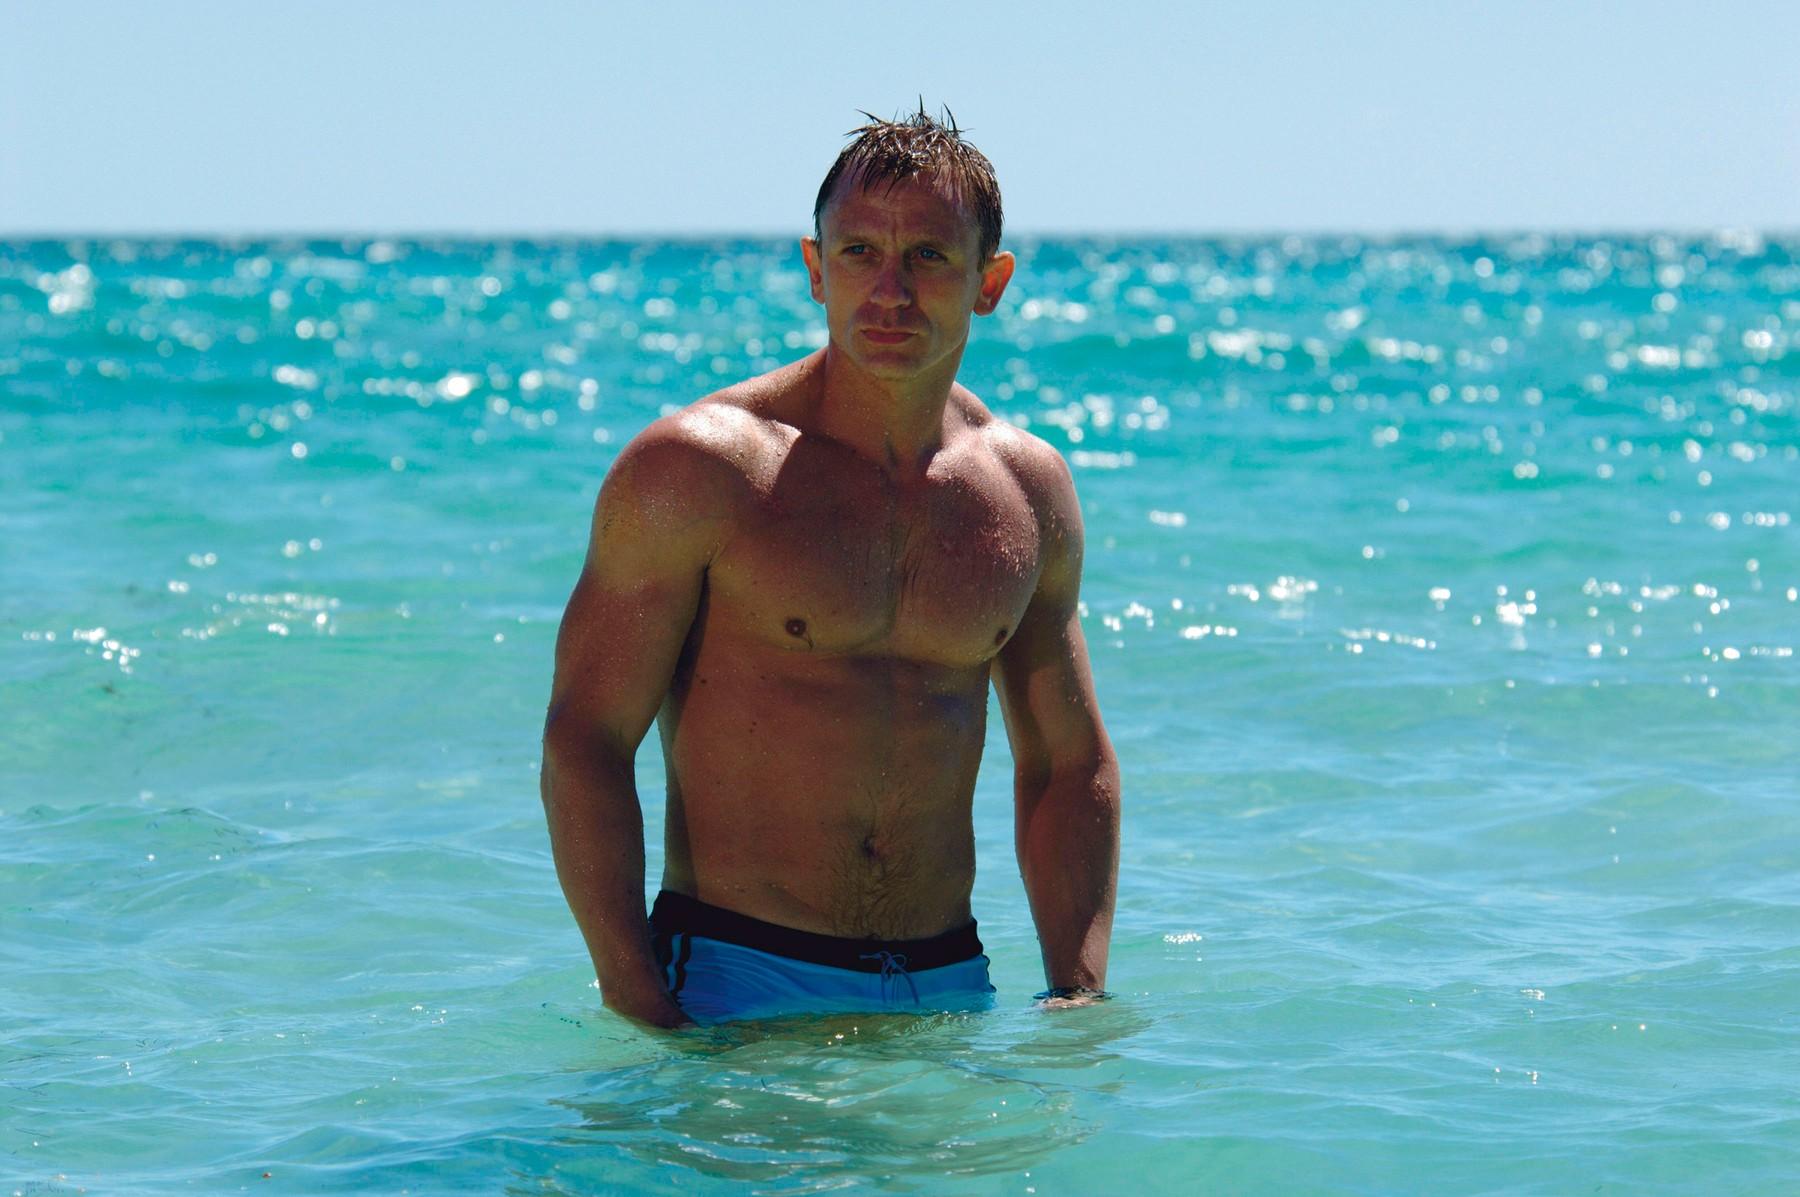 Daniel Craig u svom prvom filmu o Jamesu Bondu, 'Casino Royale'